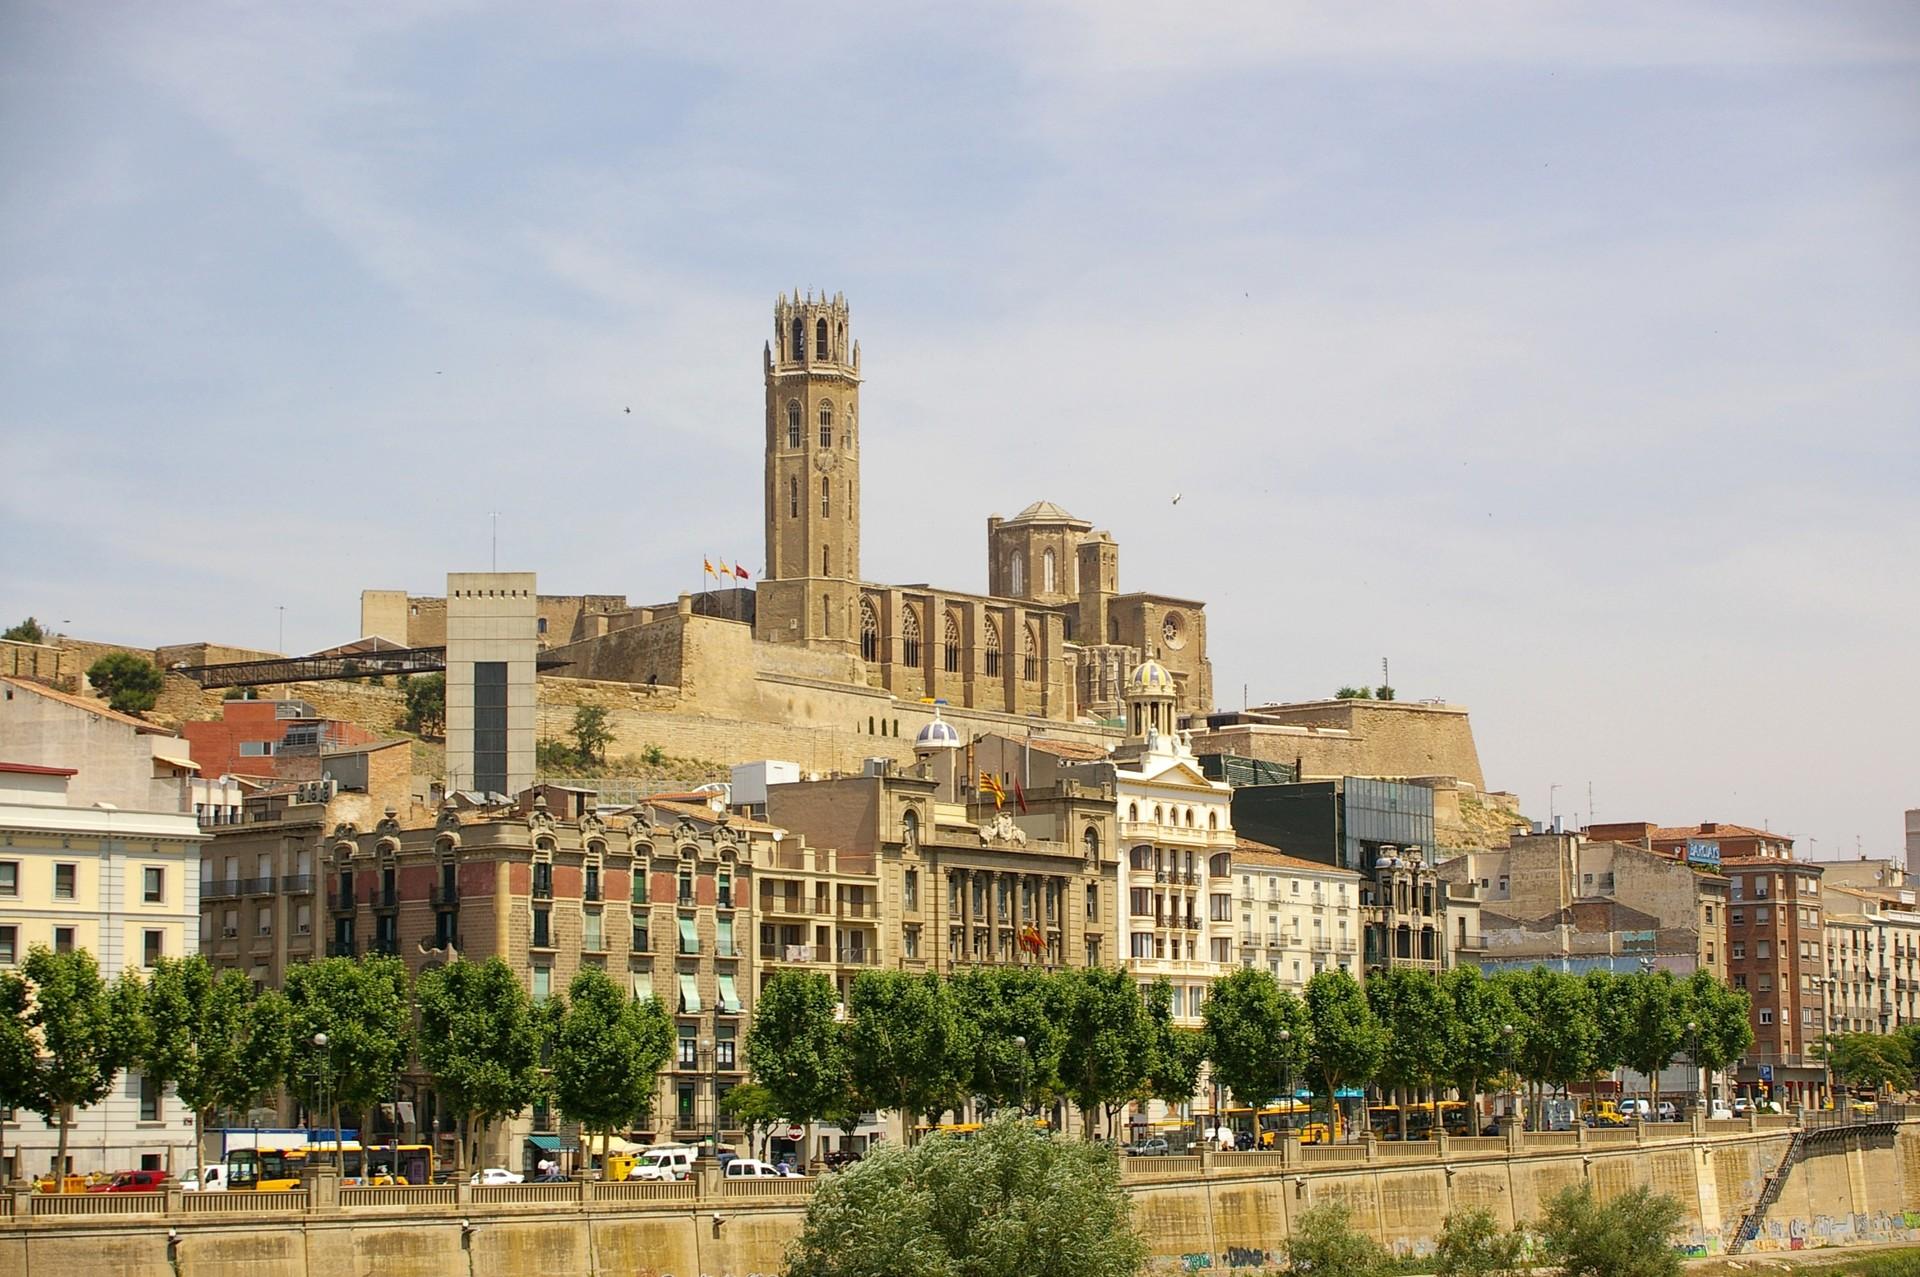 Experiencia en Lleida, España por Miriaam